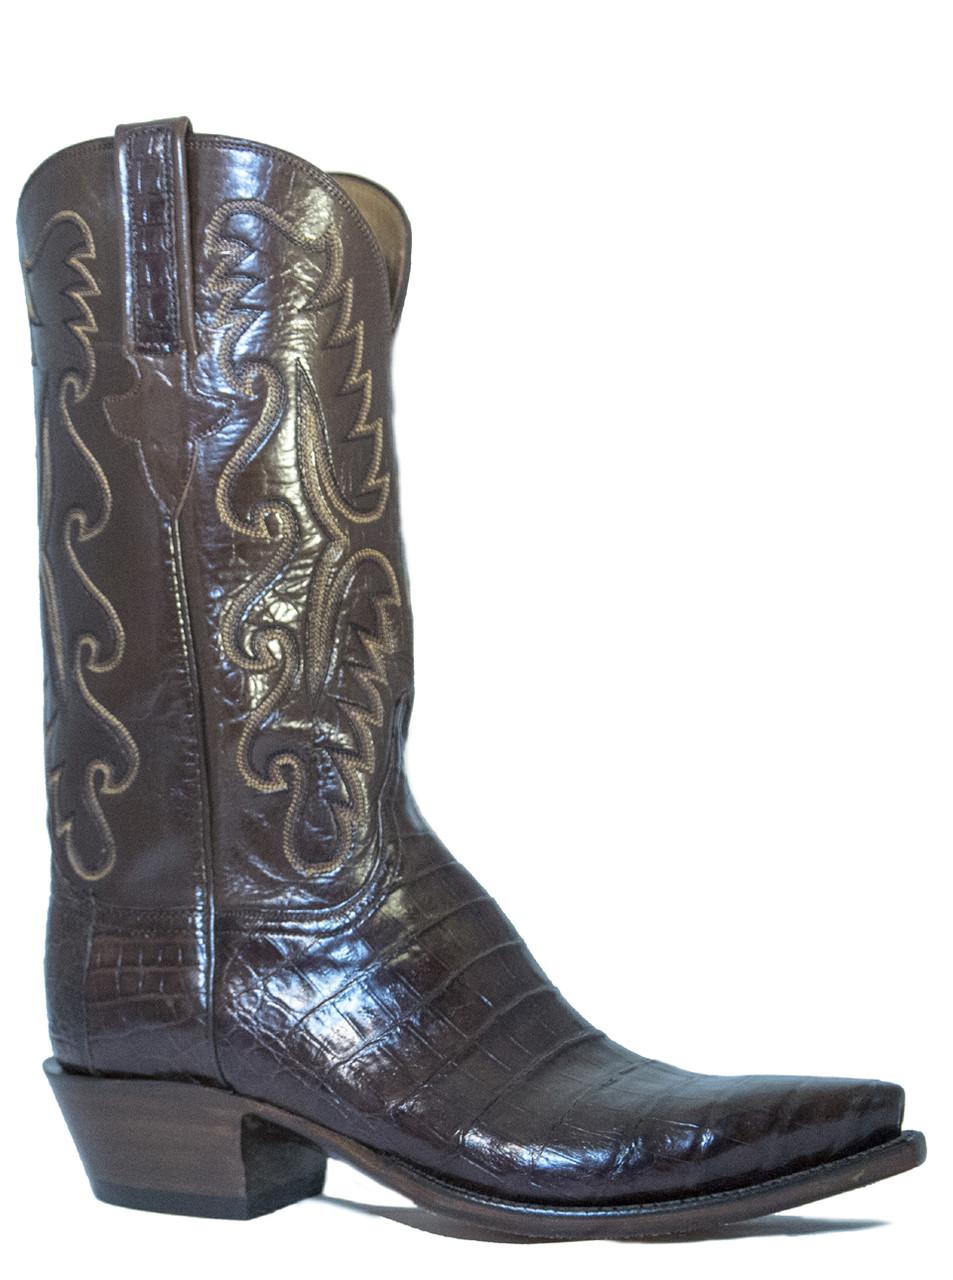 07706748c5a Lucchese Men s E2145.54 Classic Caiman Belly Crocodile Cowboy ...